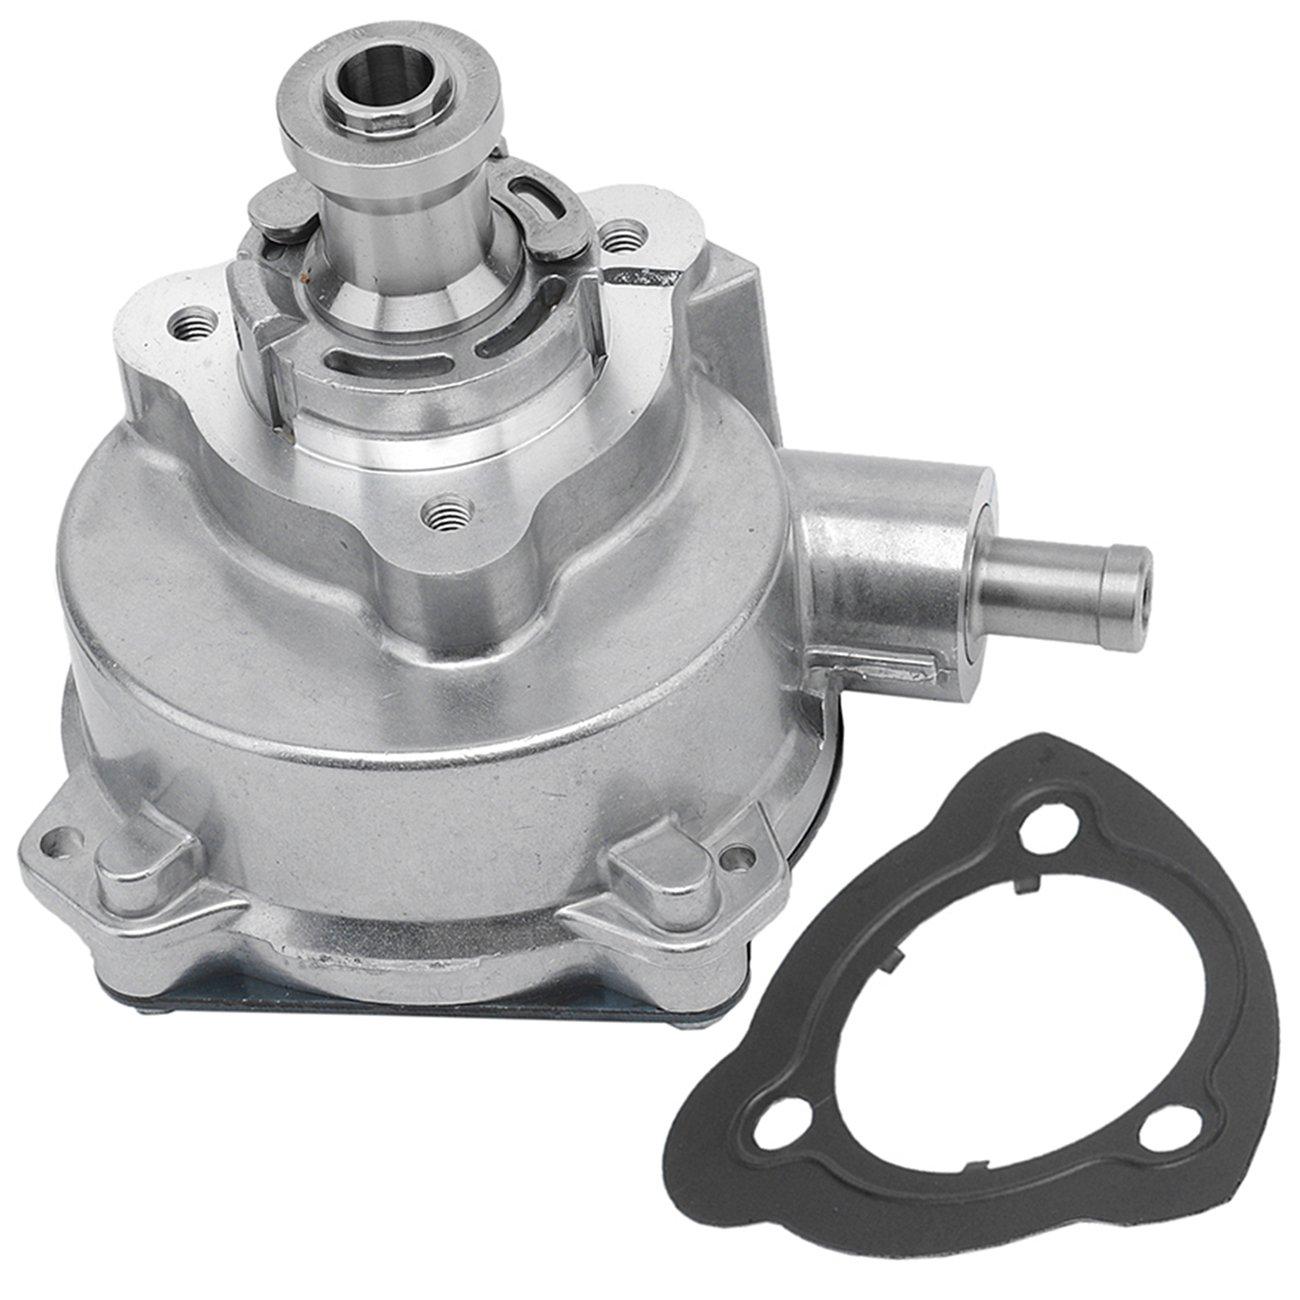 Bapmic 11667519457 Brake Vacuum Pump for BMW E60 E61 E90 E91 Z4 E85 E86